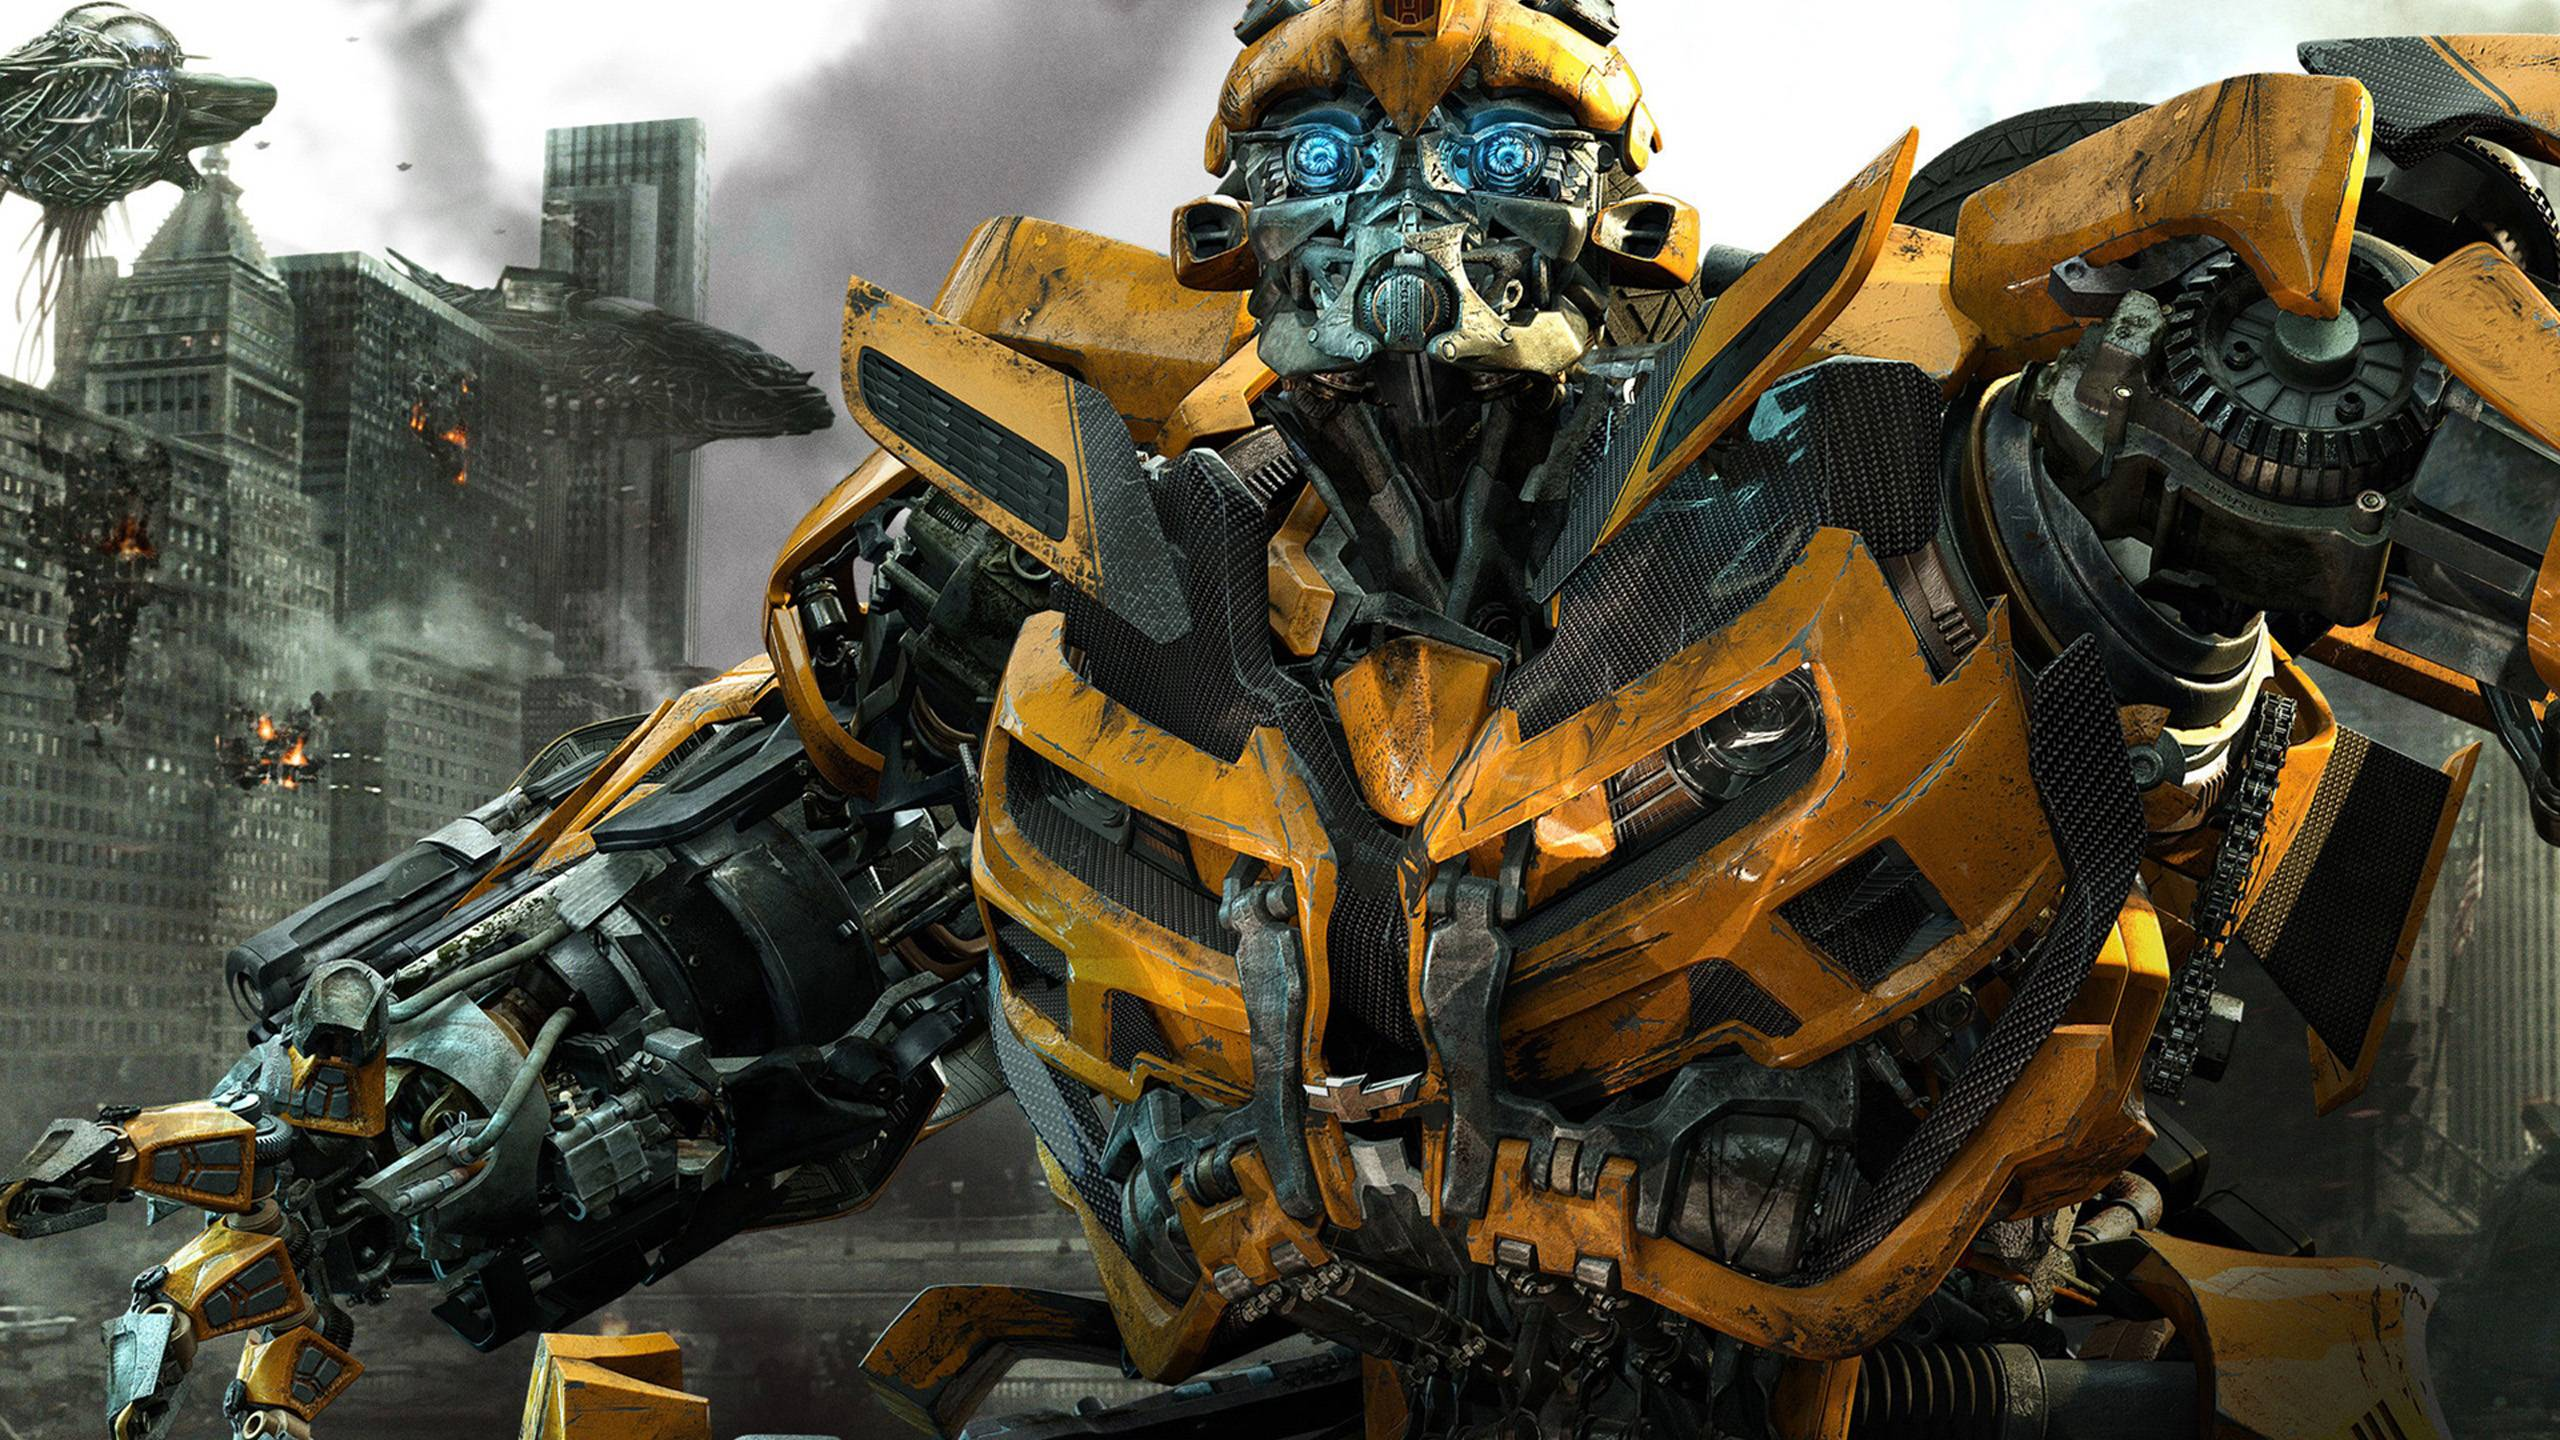 Transformers Wallpaper - HD Wallpapers